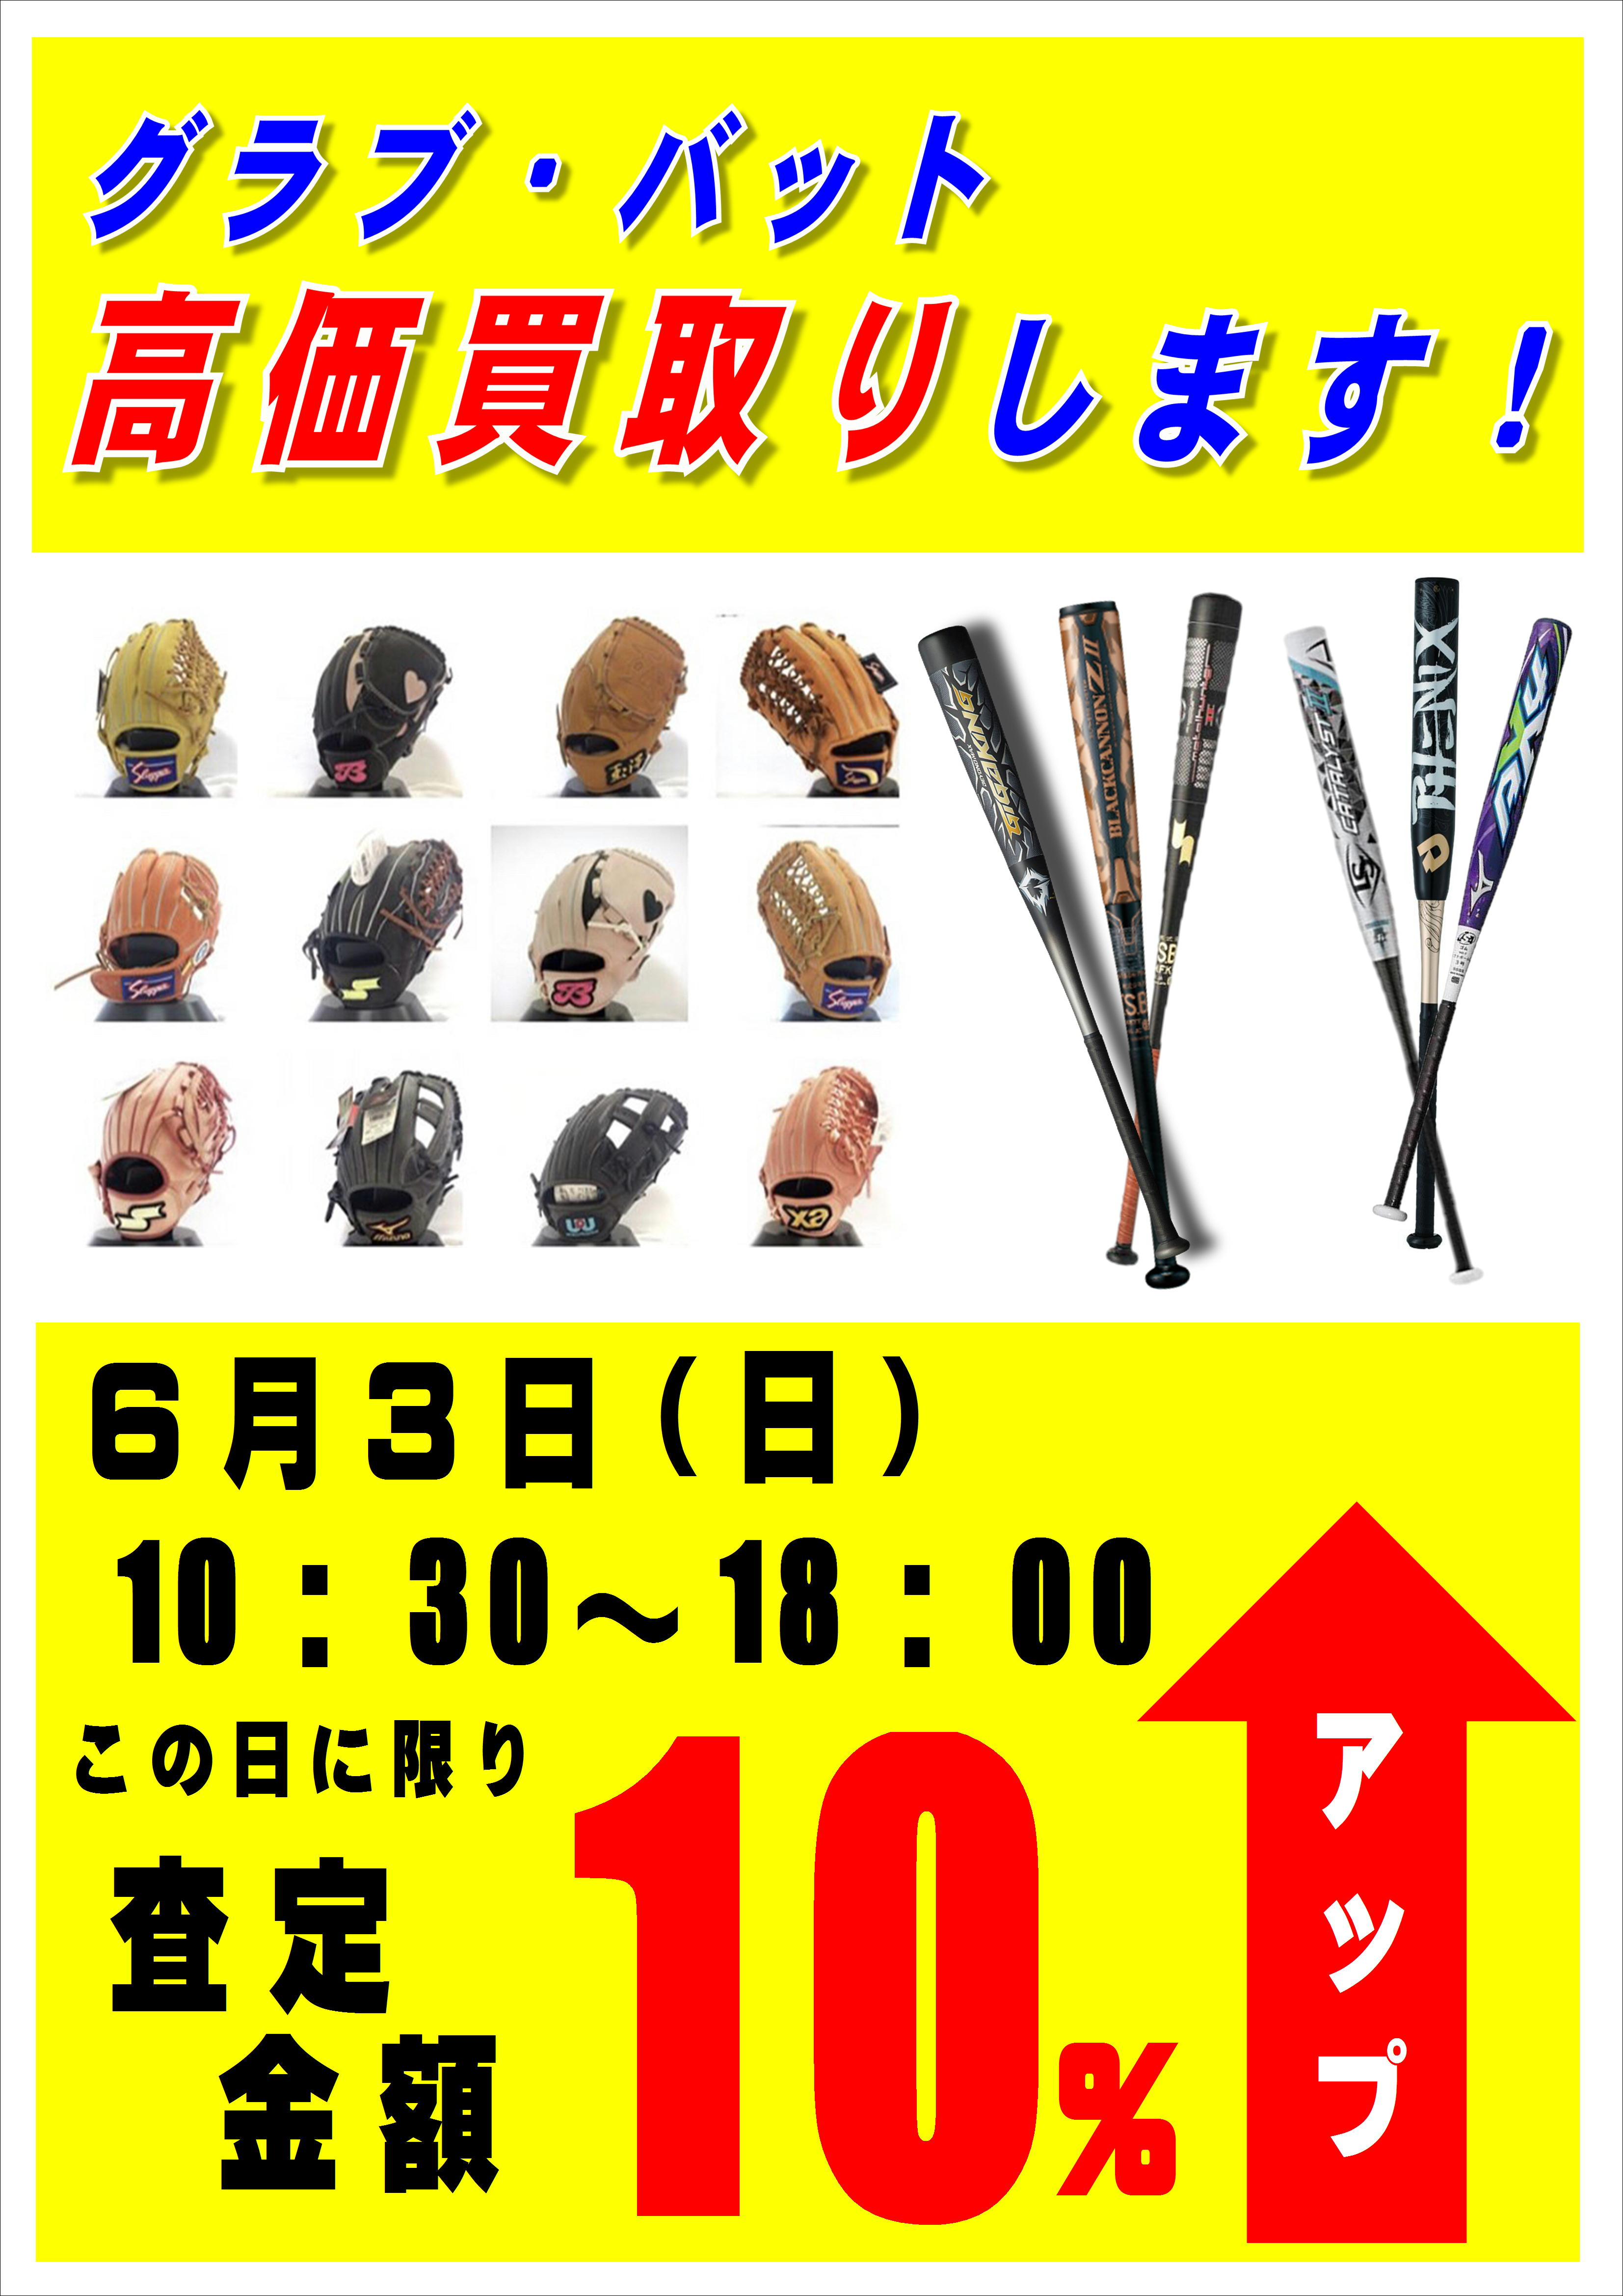 http://www.playsports.jp/news/images/%E8%B2%B7%E5%8F%96.JPG